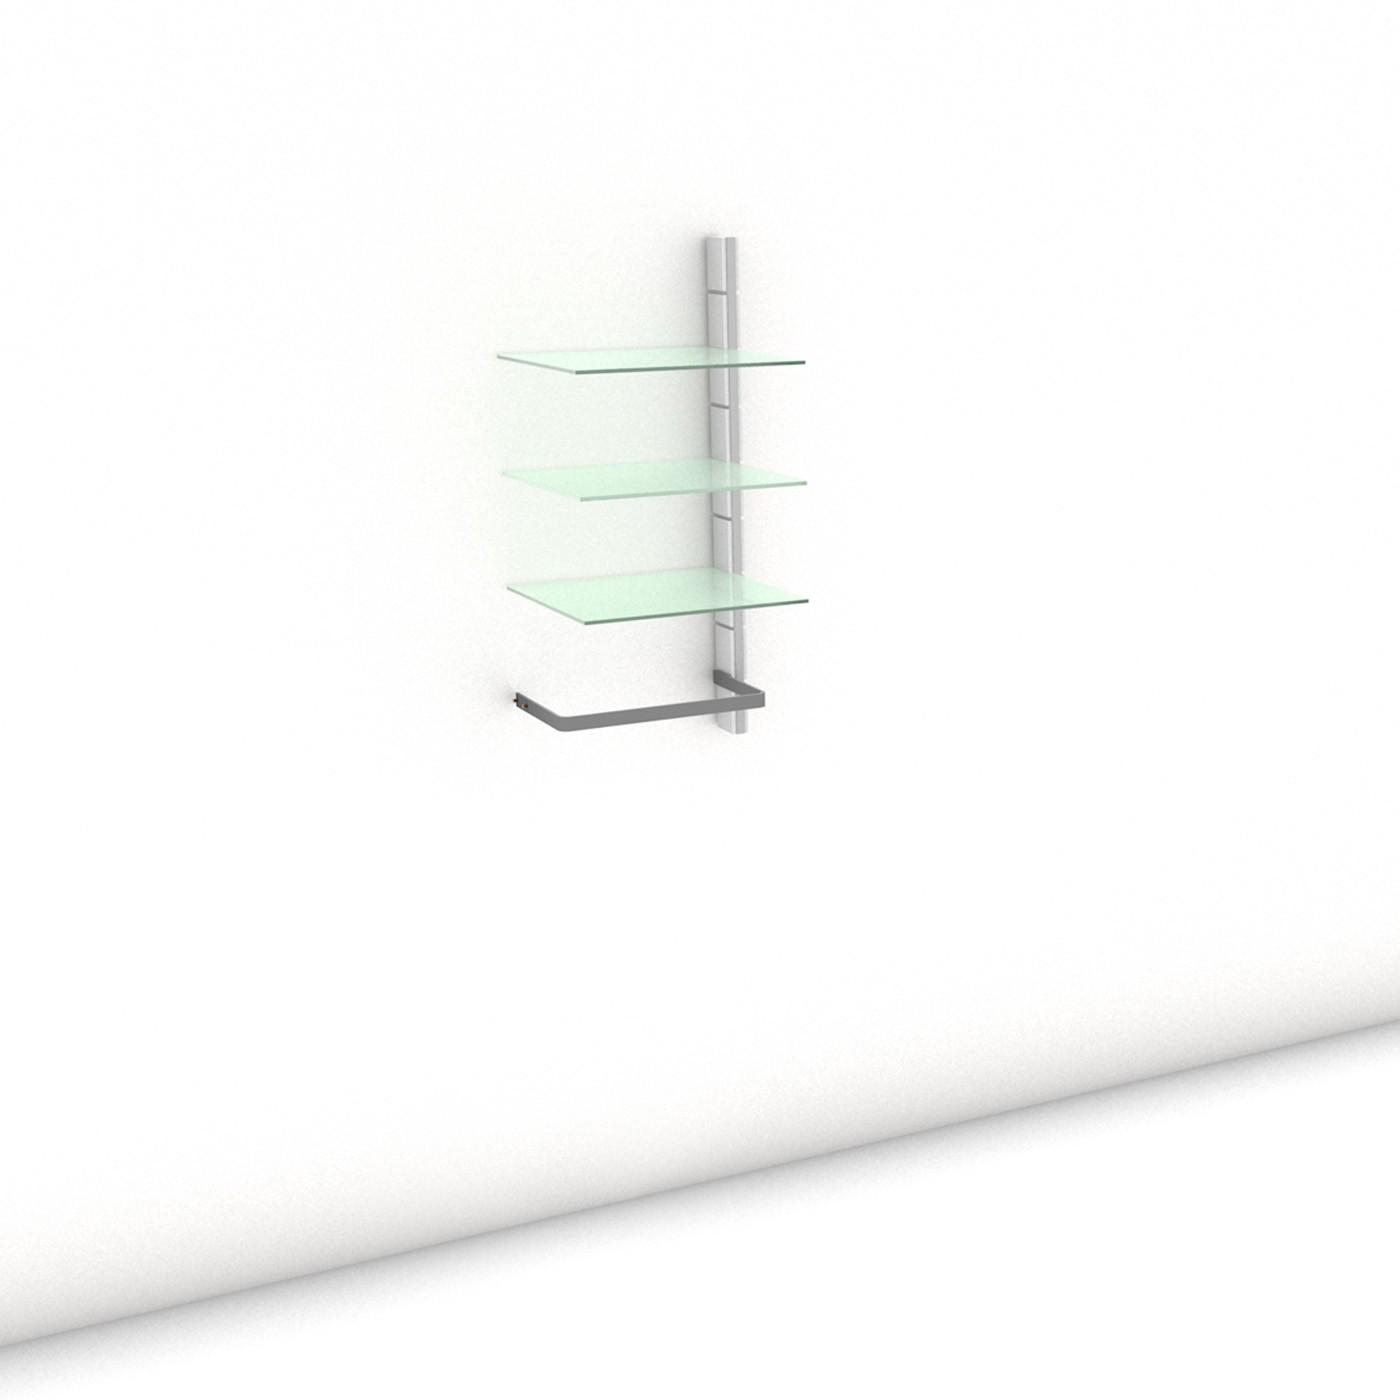 Begehbarer Kleiderschrank - Comfort (M) 51 - Anbauelement - Maß: 51 x 107,2 x 45 cm (B x H x T)